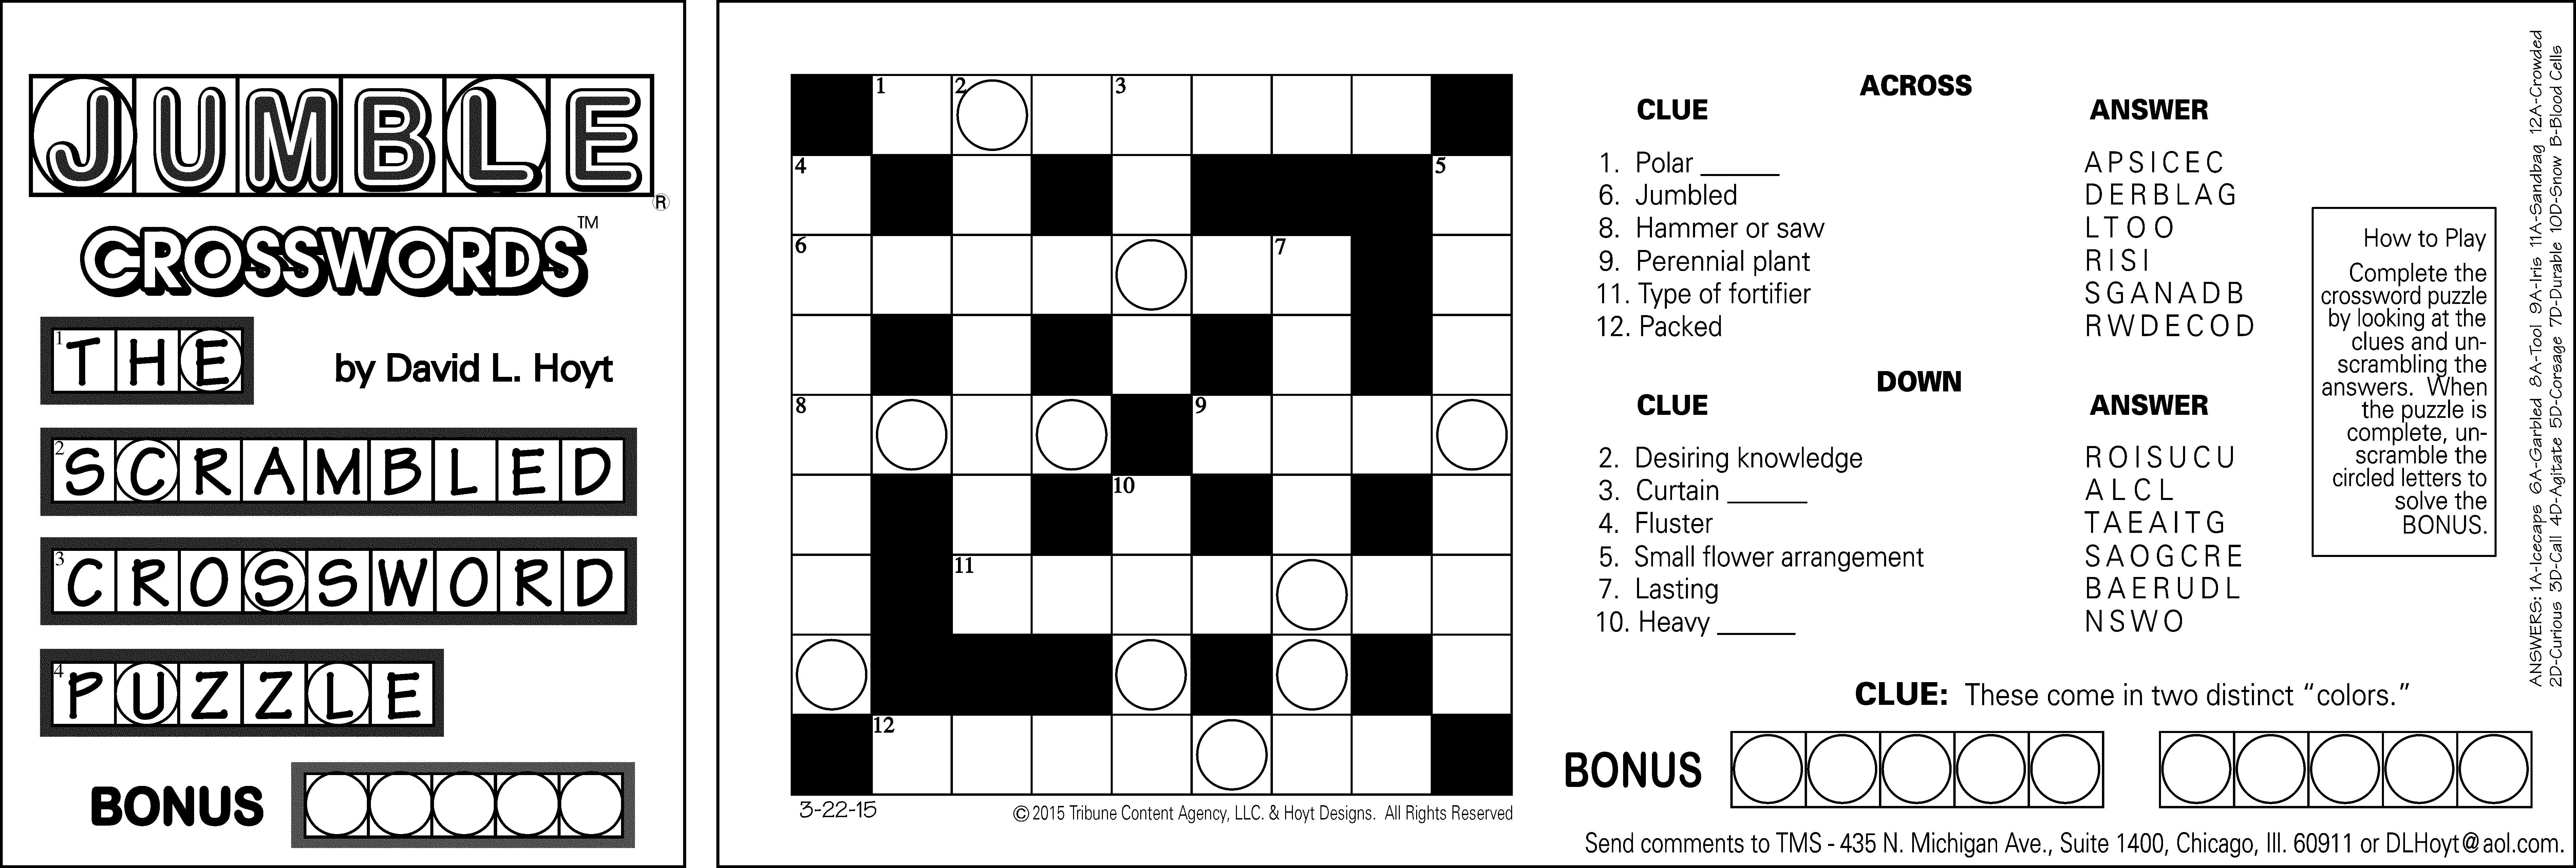 Sample Of Horizontal Sunday Jumble Crosswords | Tribune Content - Printable Jumble Puzzles With Answers